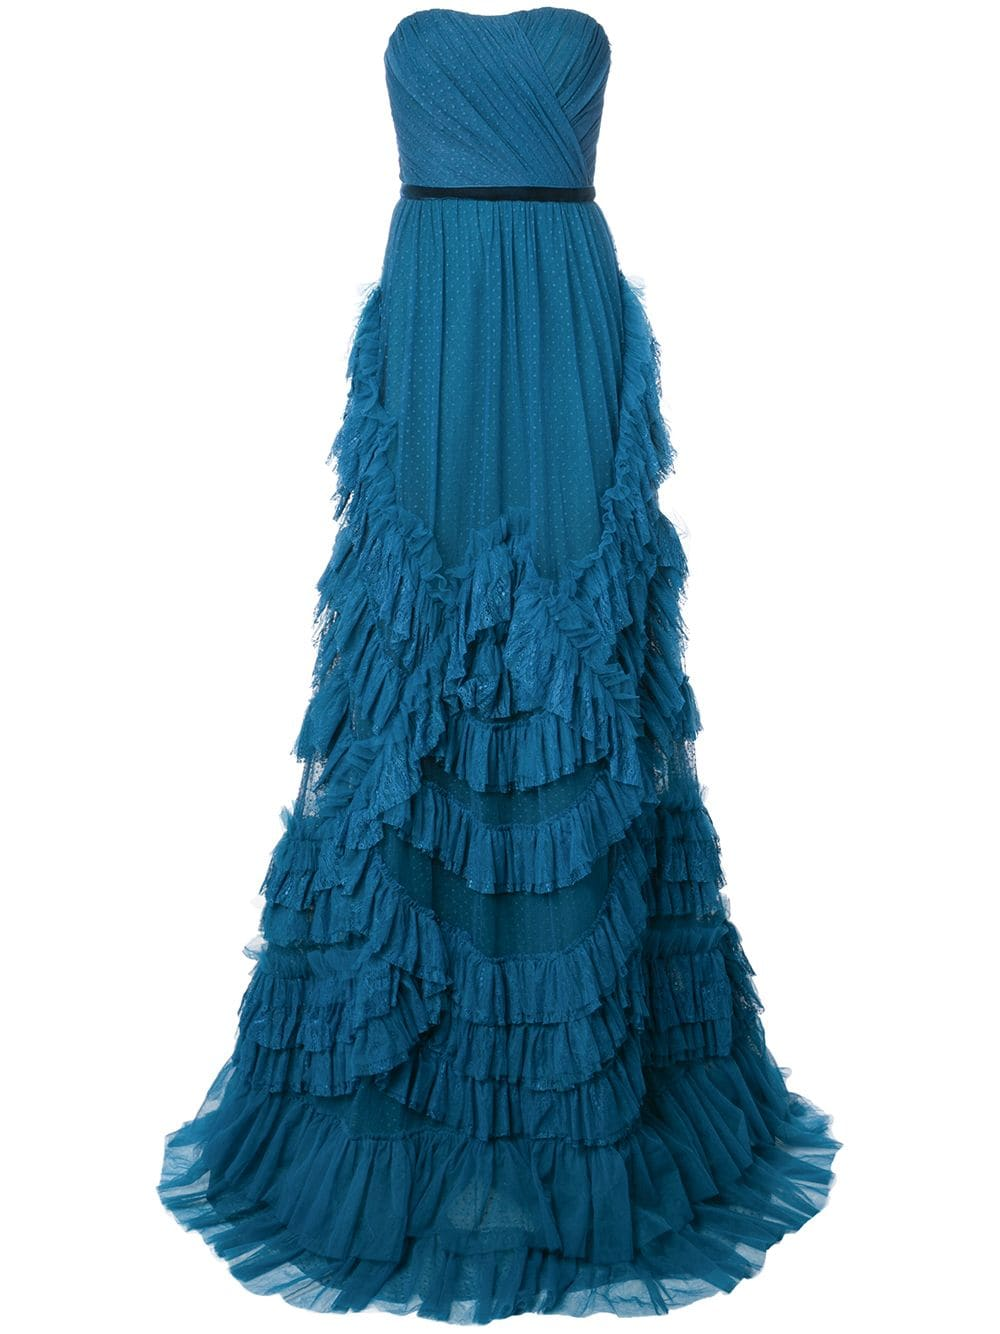 Marchesa Notte Ruffled Strapless Dress Farfetch Strapless Ruffle Dress Dresses Gowns Of Elegance [ 1334 x 1000 Pixel ]